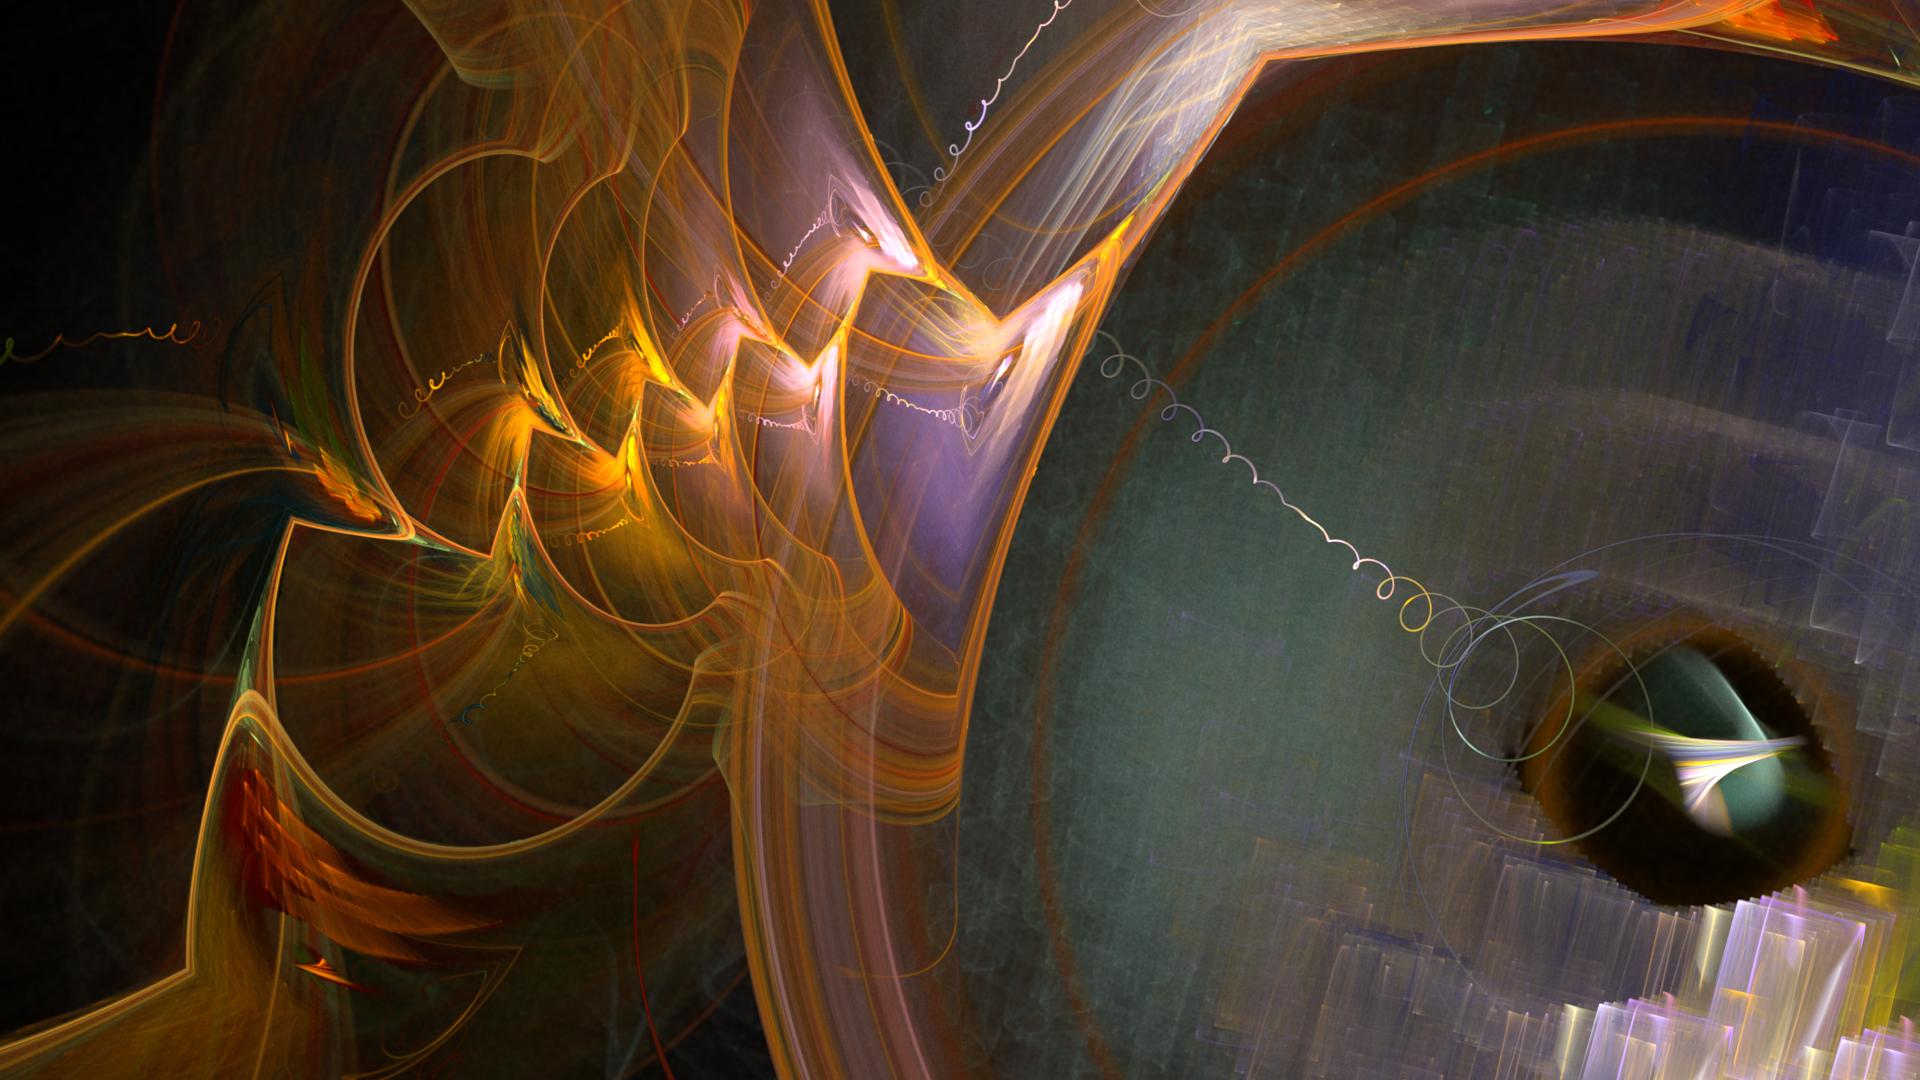 Design Radical Electricsheep Visionary Transhumanism HD wallpapers 1920x1080